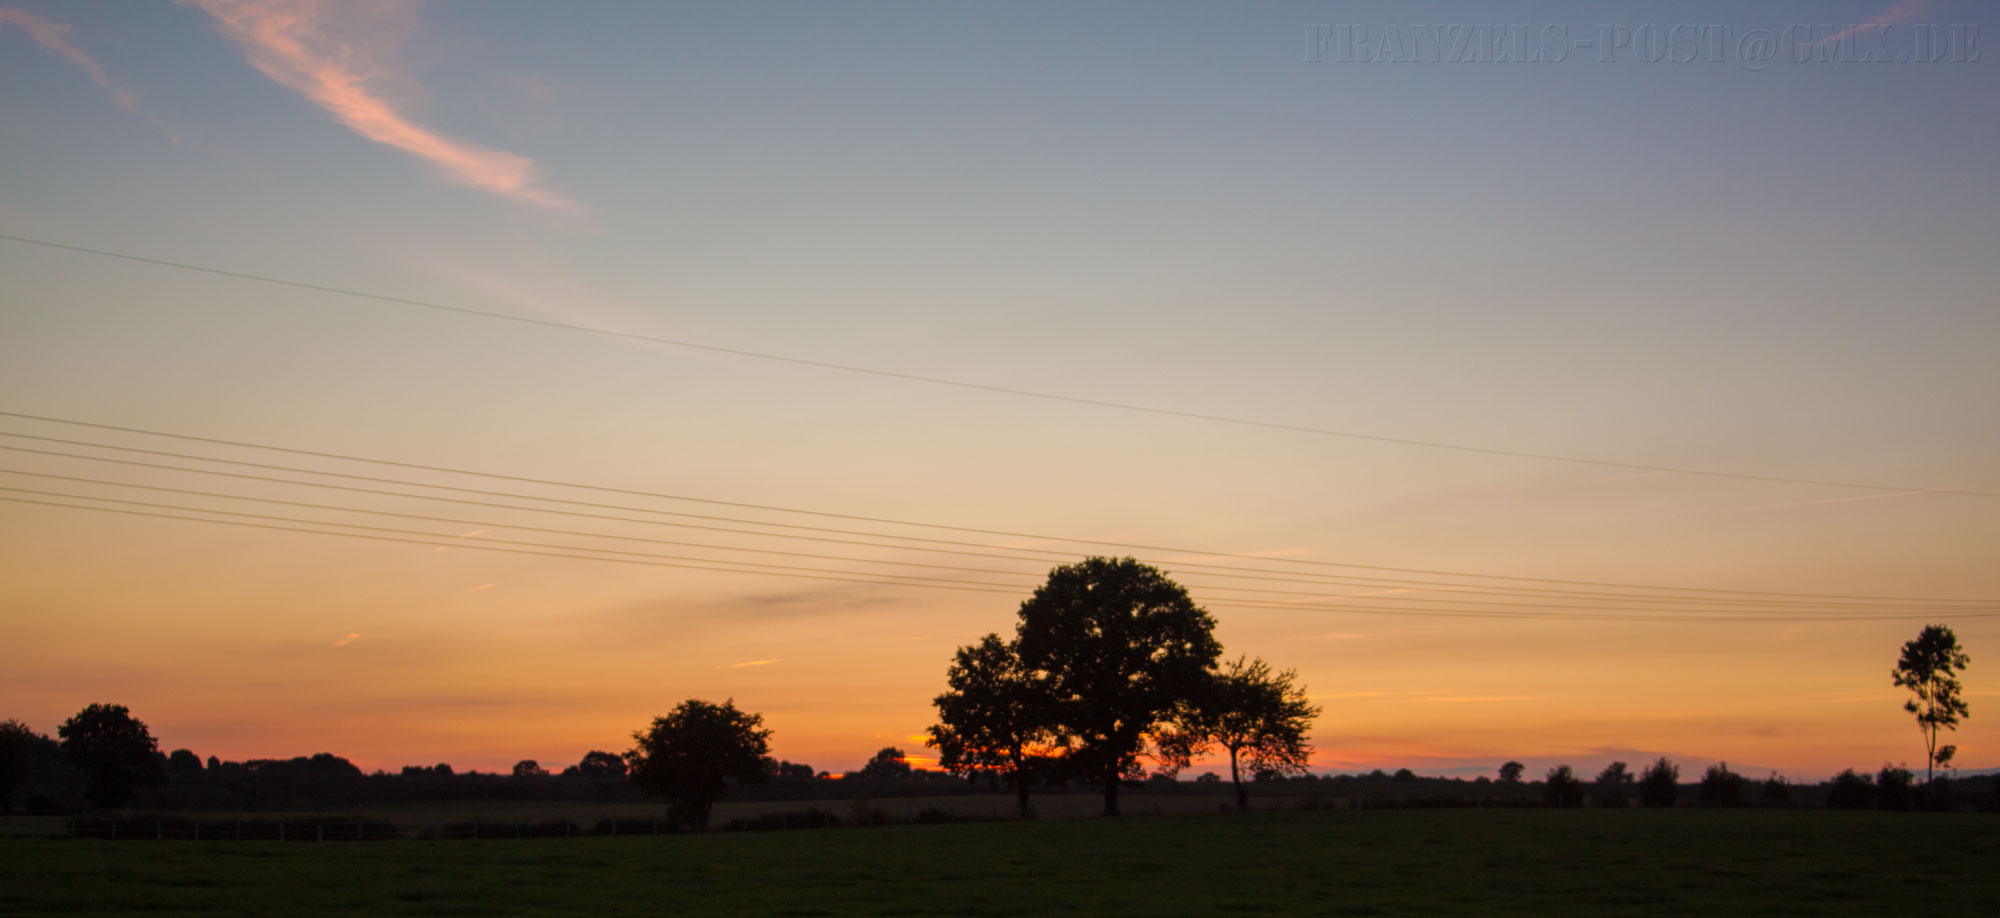 Sonneuntergang über Felder